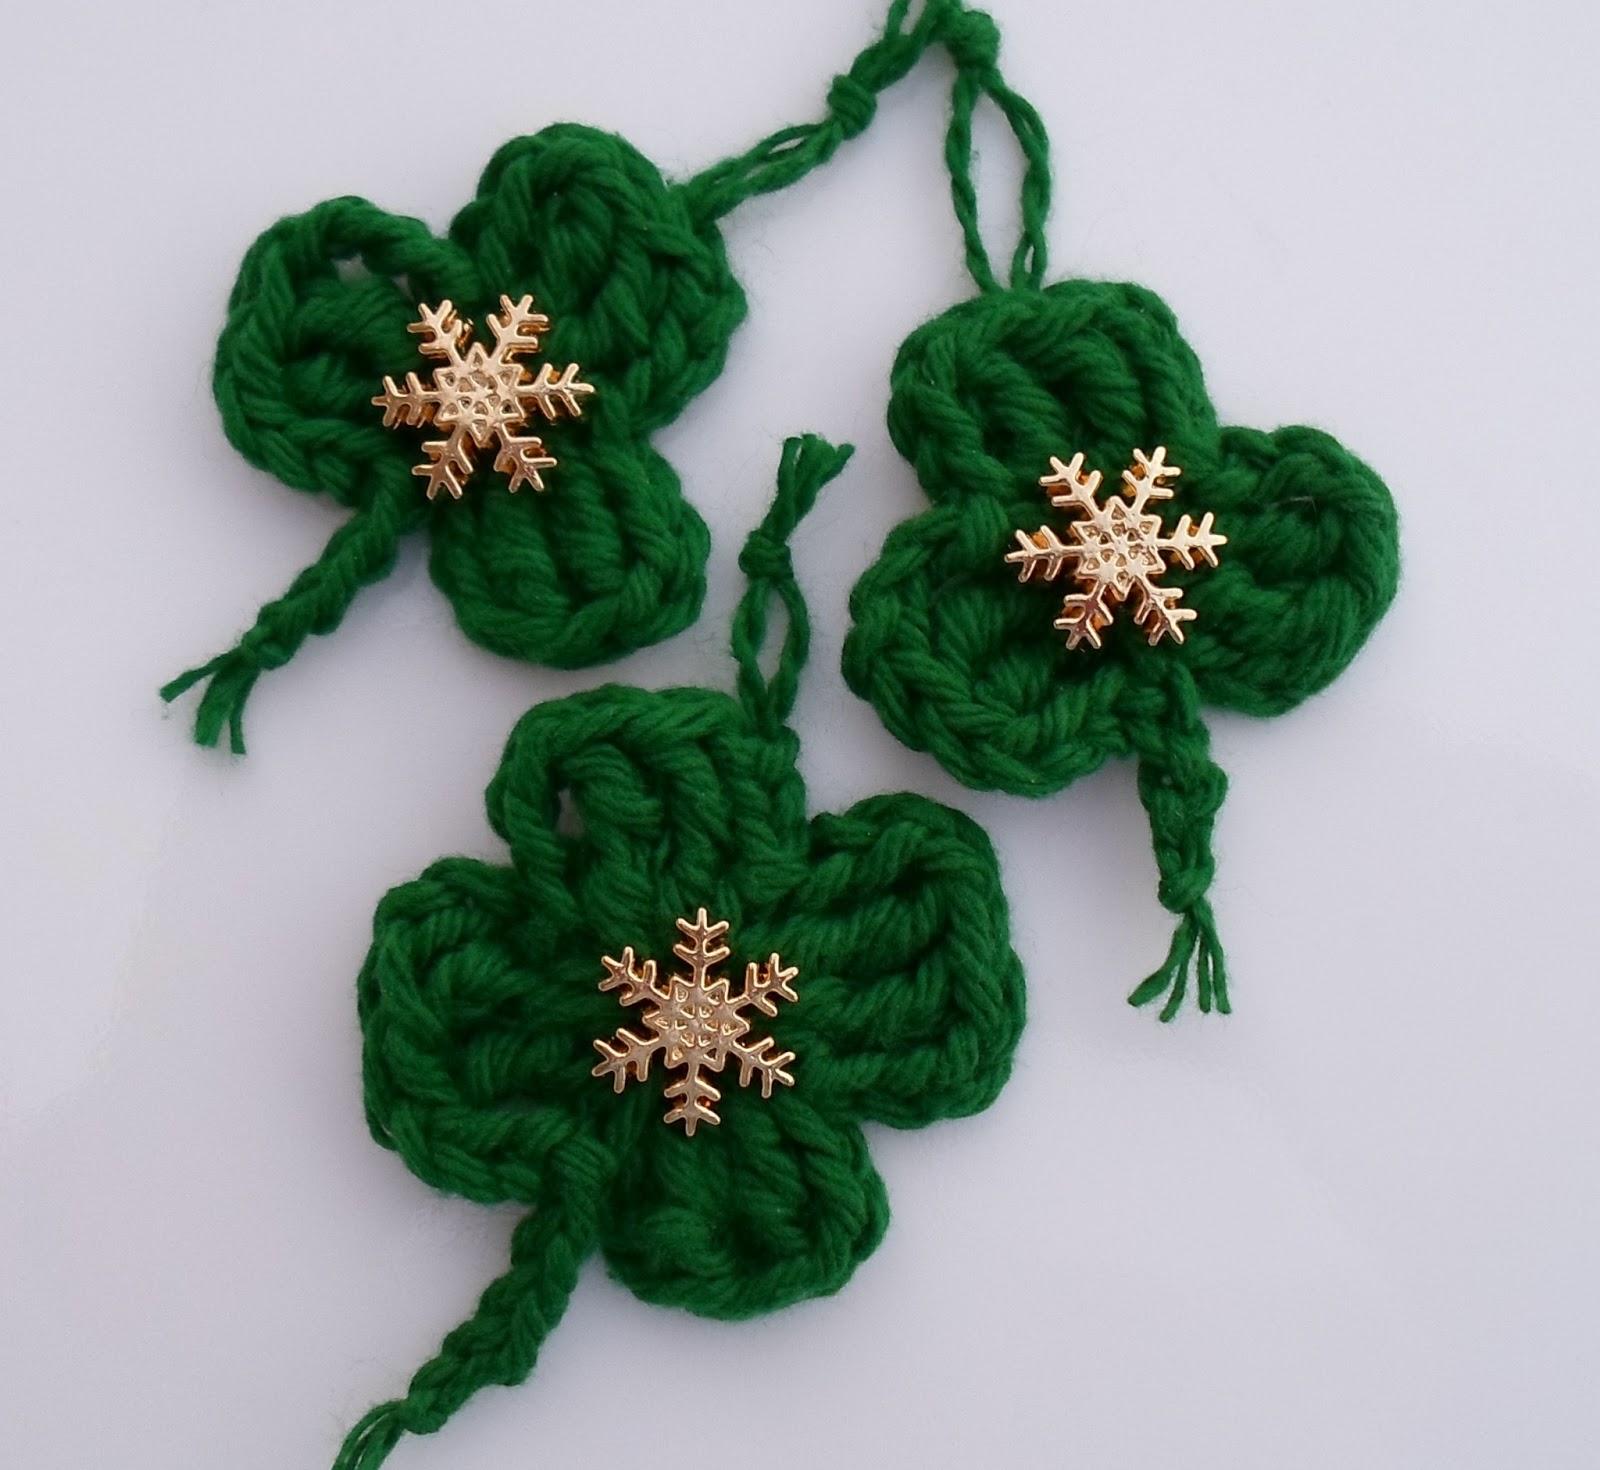 Crochet Shamrock Ornament, Pin or Embellishment